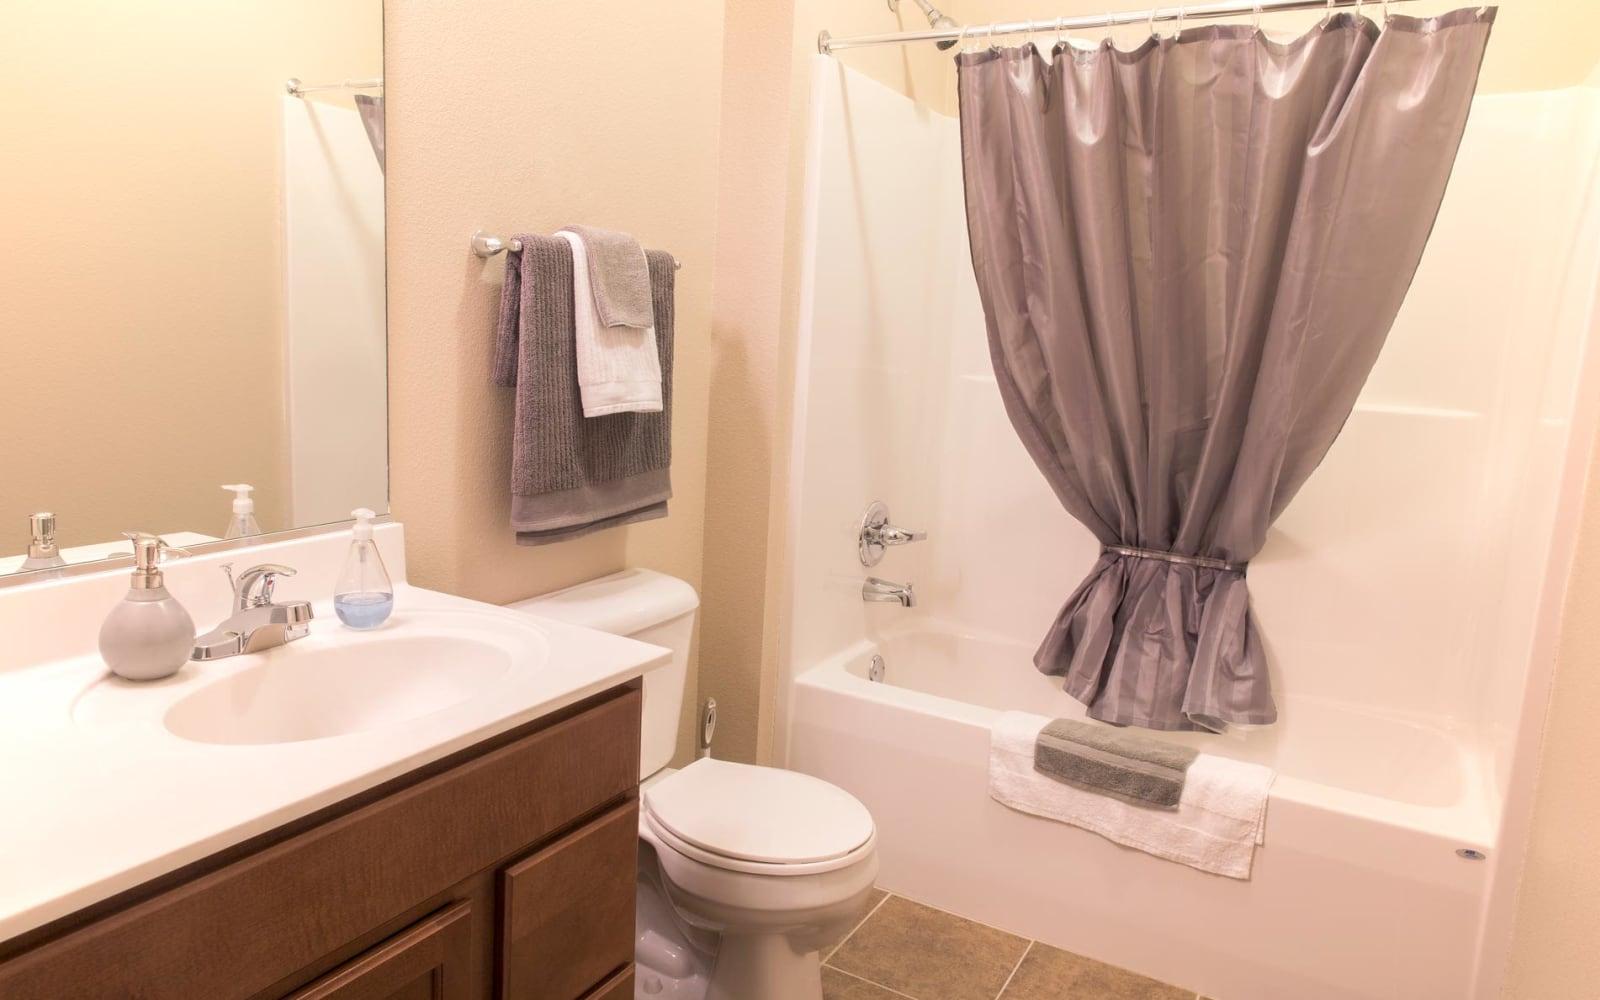 An apartment bathroom with a bathtub at Prairie Pointe Student Living in Ankeny, Iowa